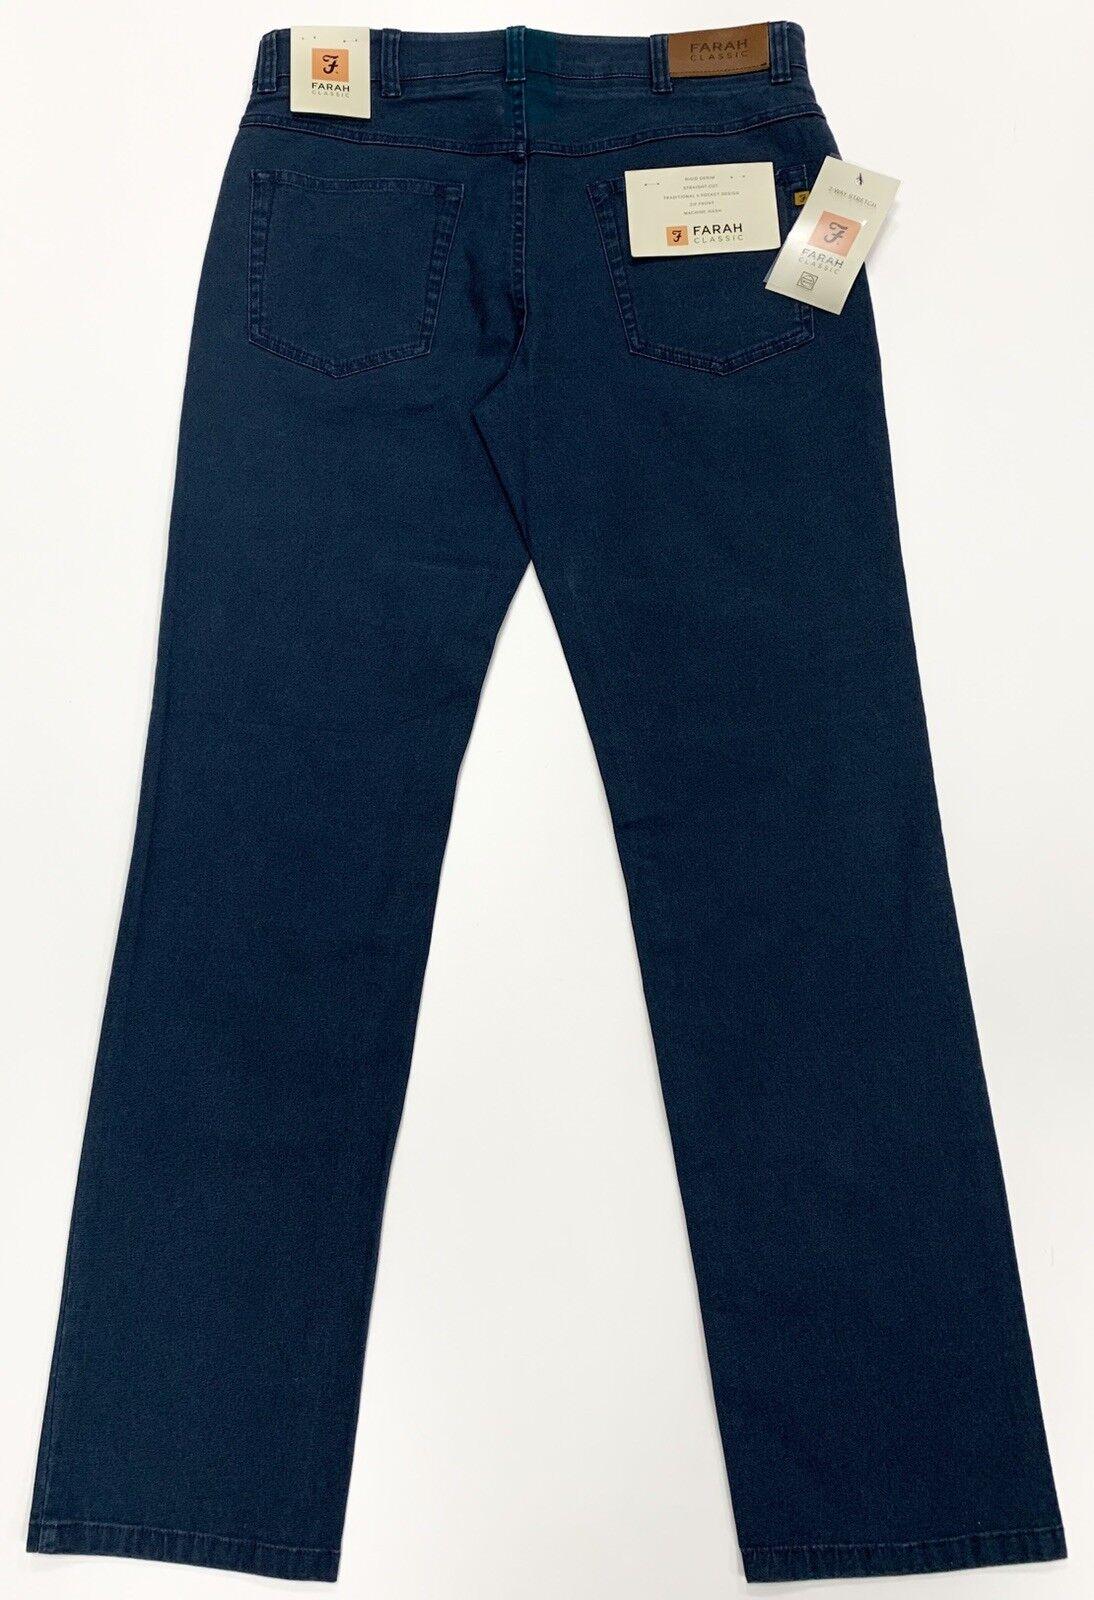 Xadoo Lagenlook Designer Plus Size Camicia Lunga Shirt Cachi ü60 CE sale!